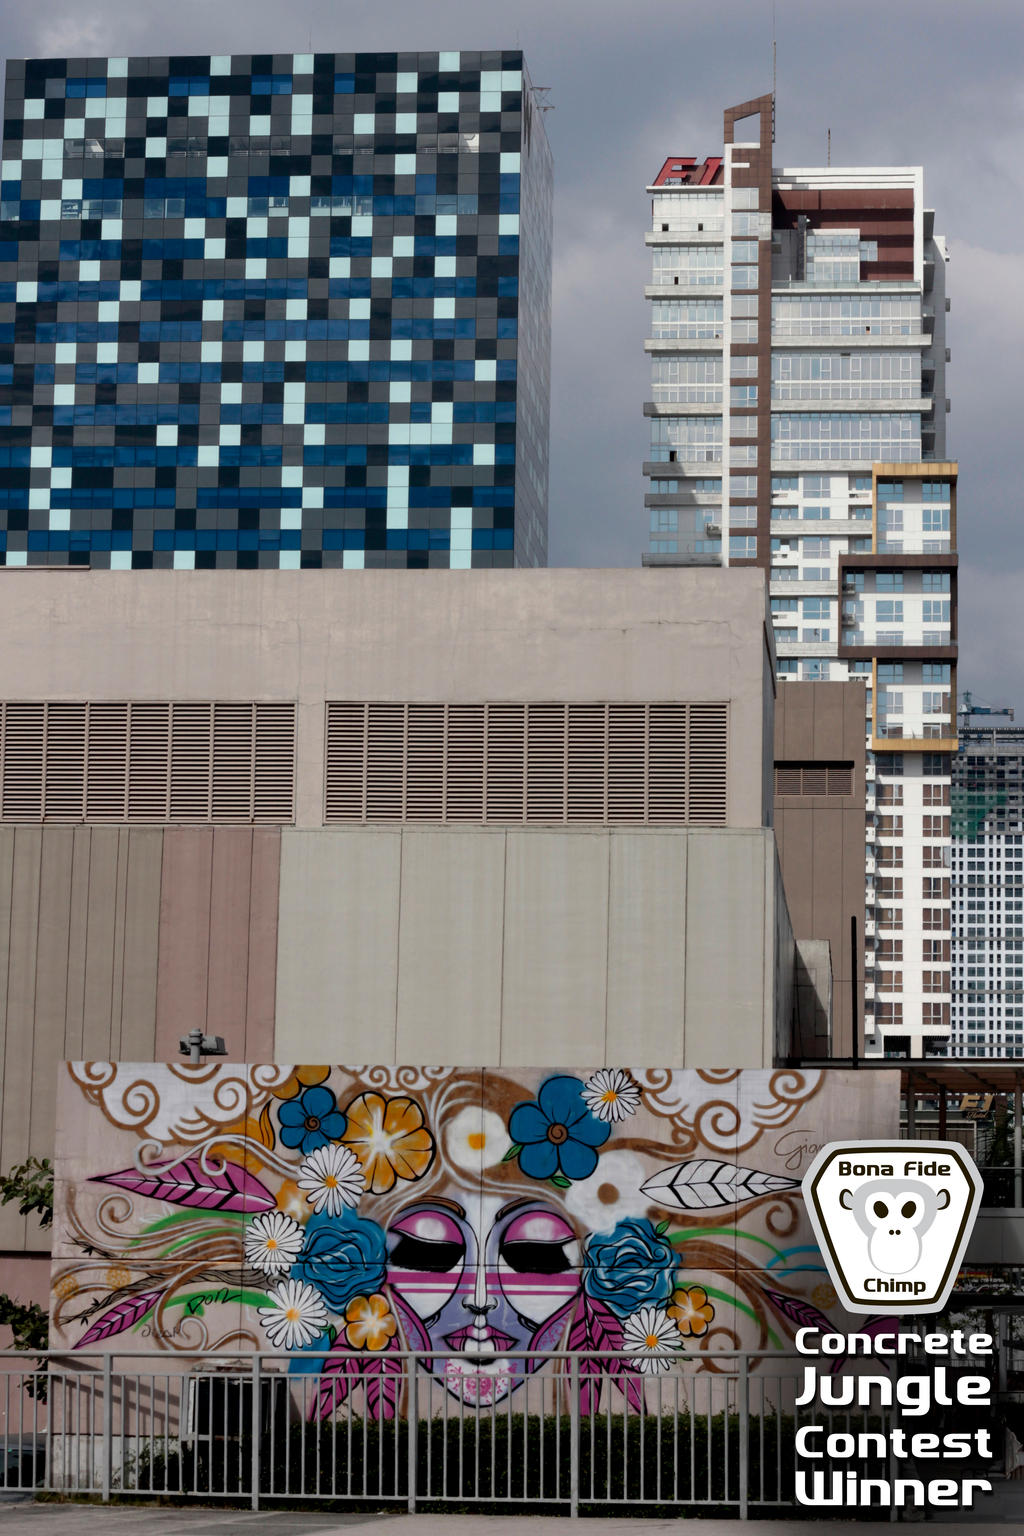 Concrete Jungle Contest Winner 2 of 2 by BonaFideChimp